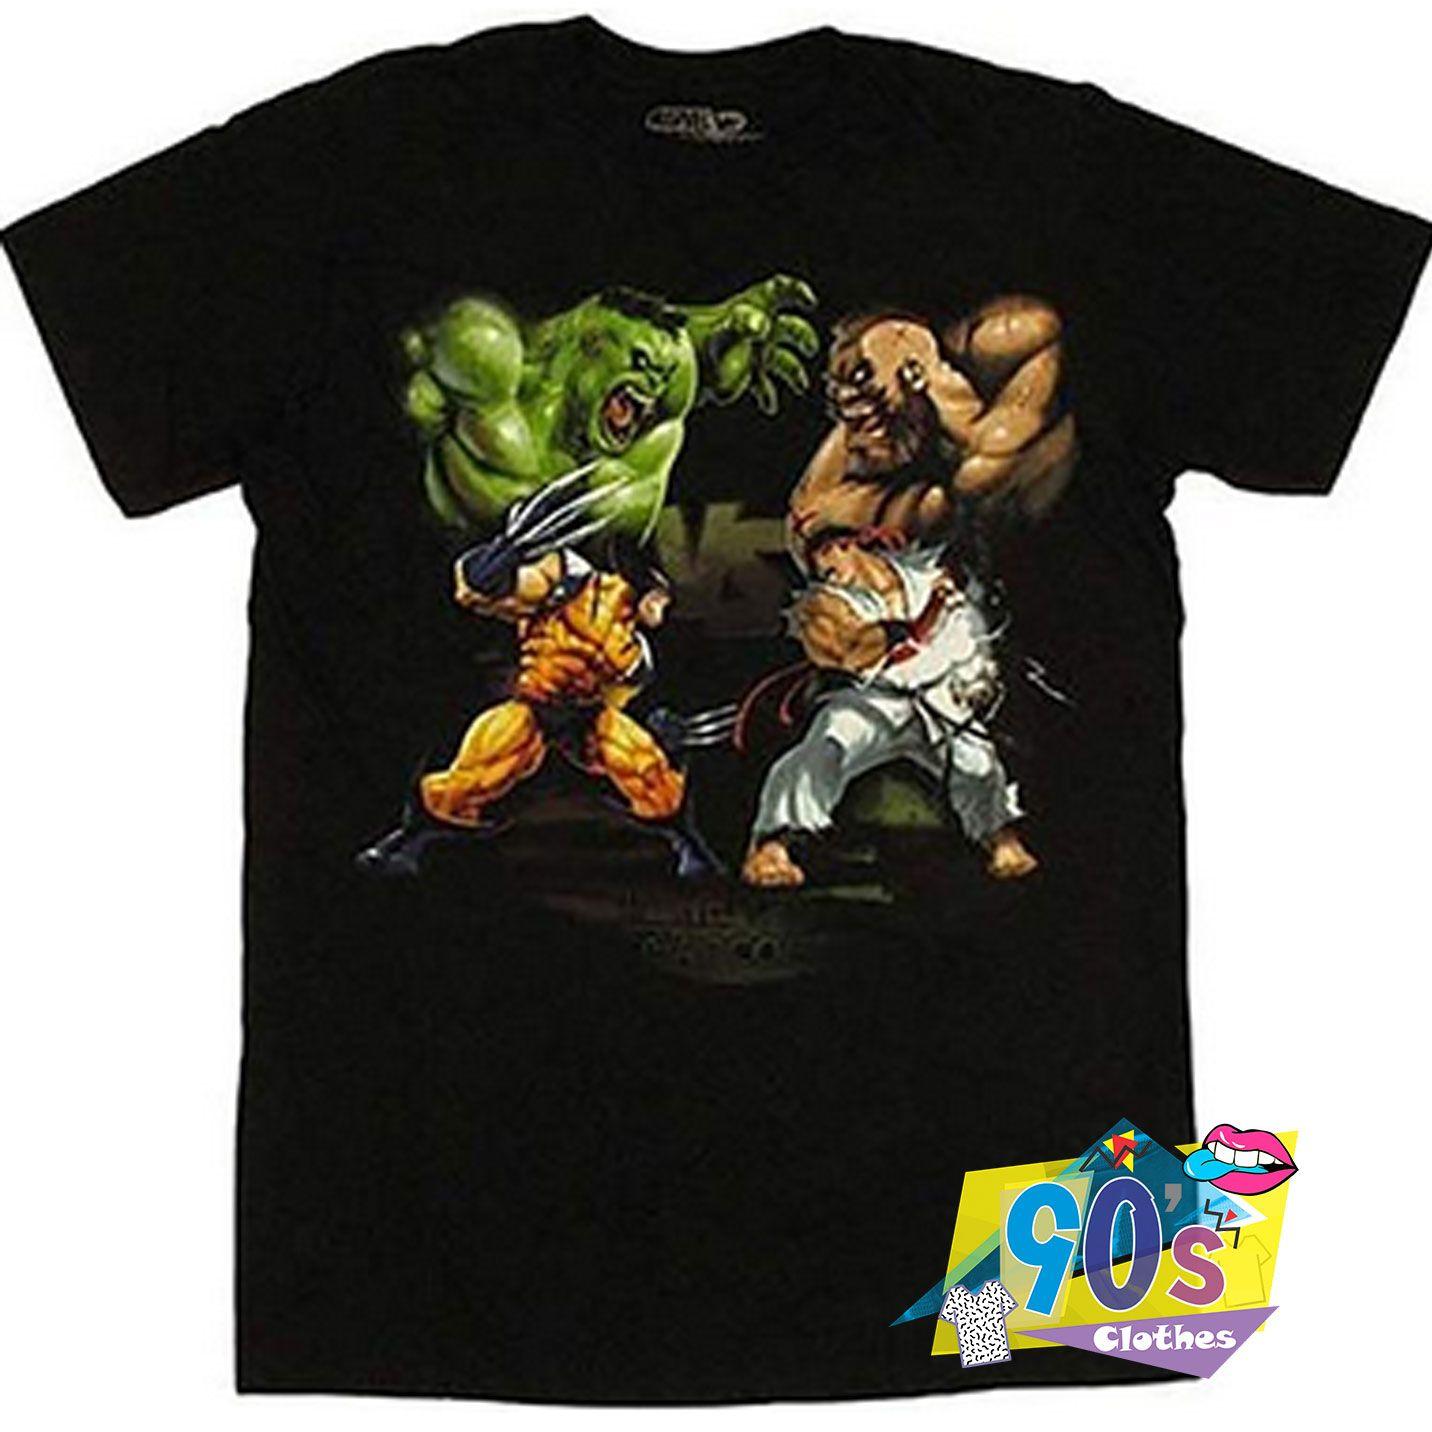 Marvel Vs Capcom And David Vs Goliath T shirt #decadedayoutfits